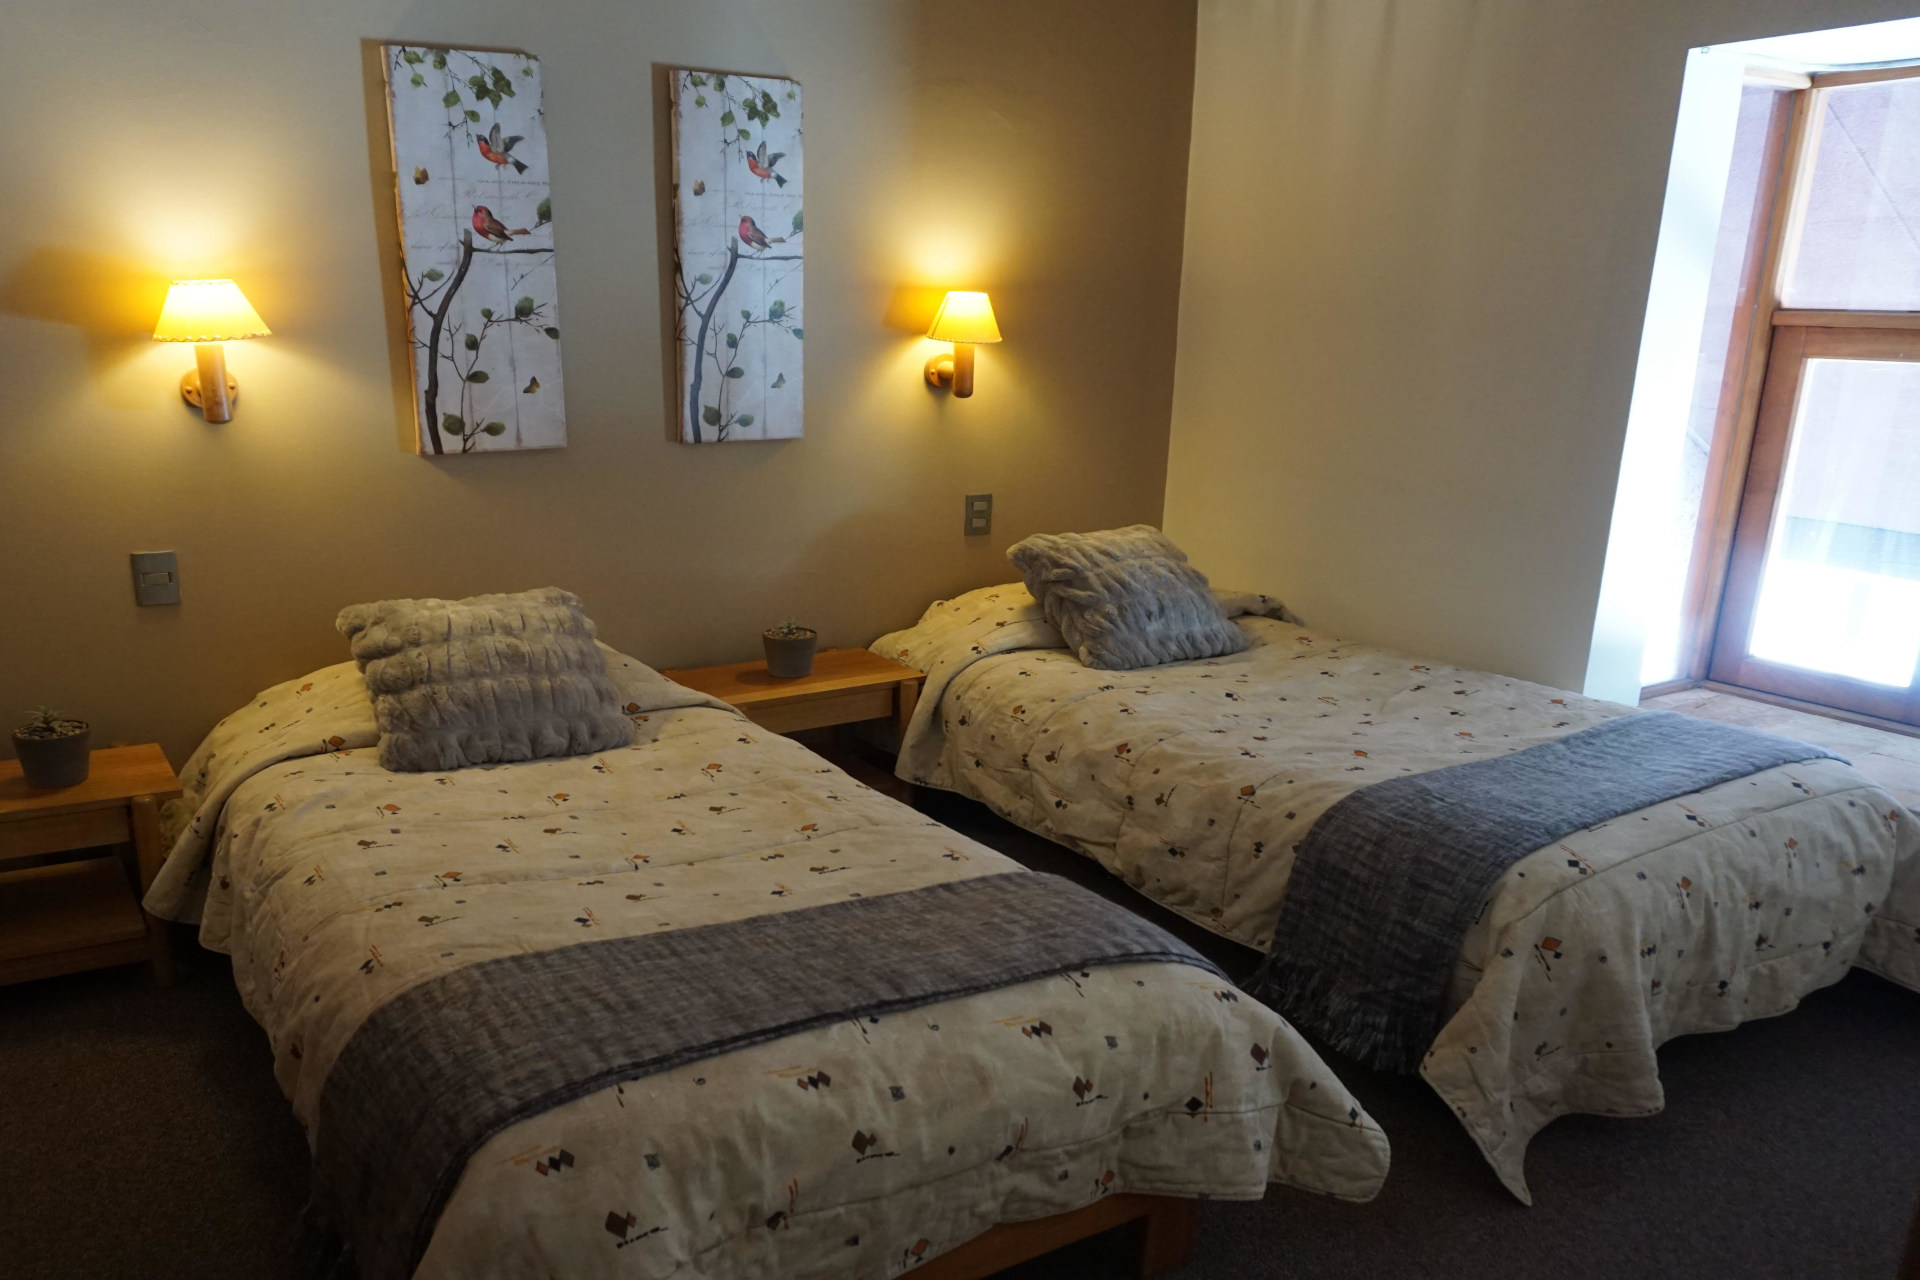 Habitación con dos camas - Departamento Tipo B 223